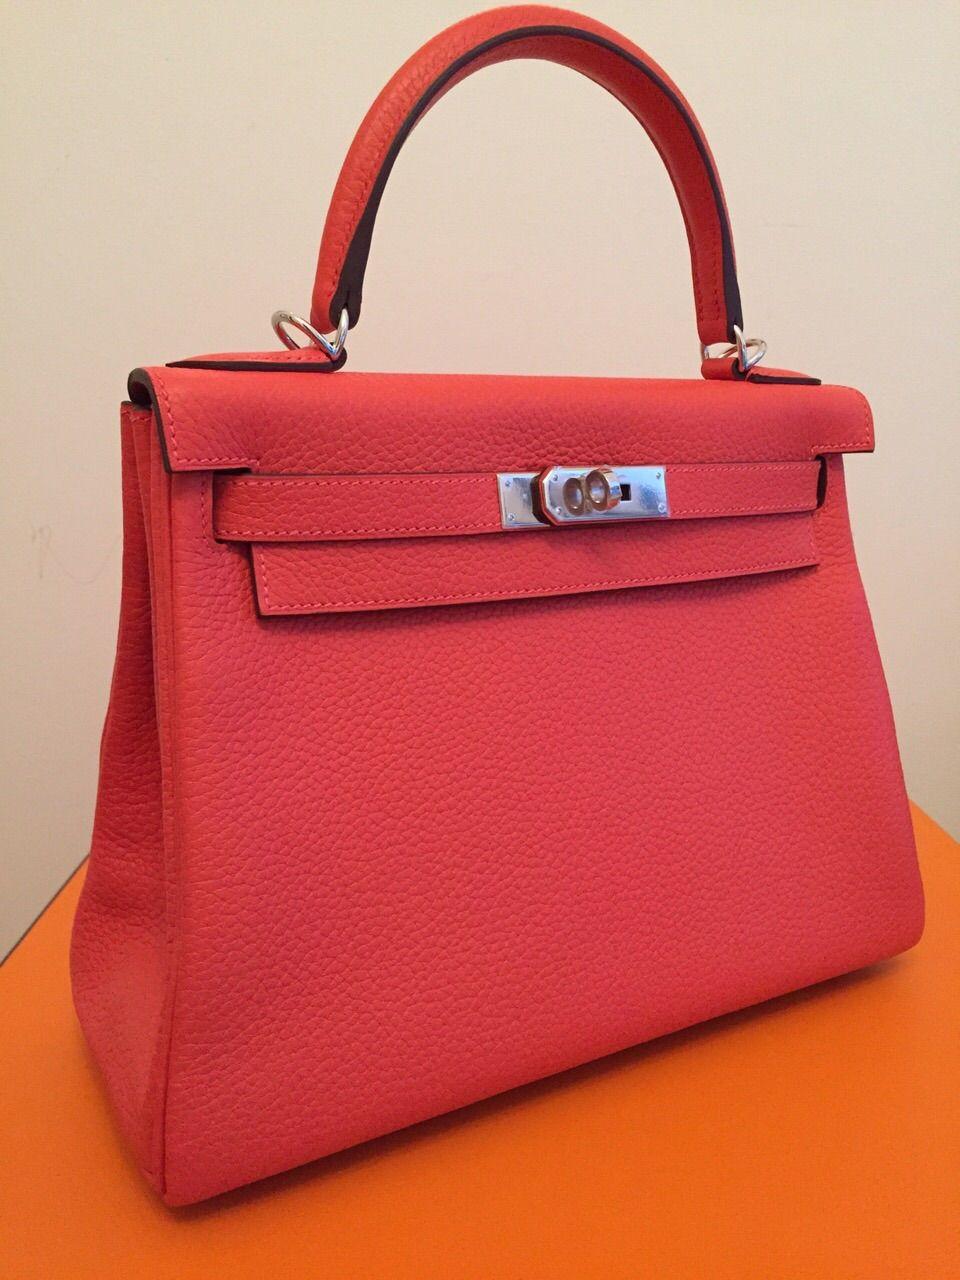 7251fc6d5741 kelly-28cm-rouge-pivoine. kelly-28cm-rouge-pivoine Hermes ...